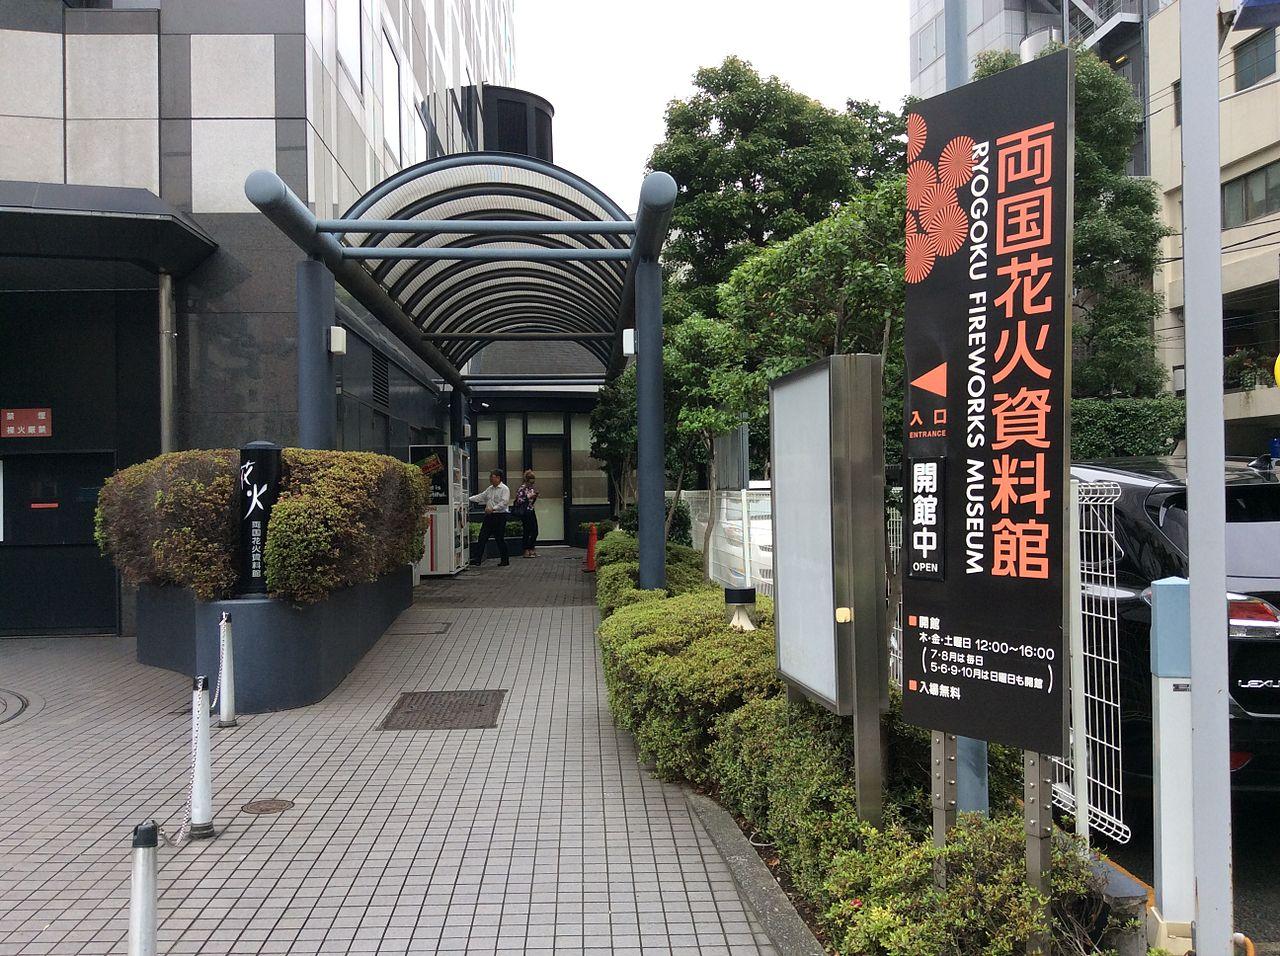 Image result for ryogoku fireworks museum